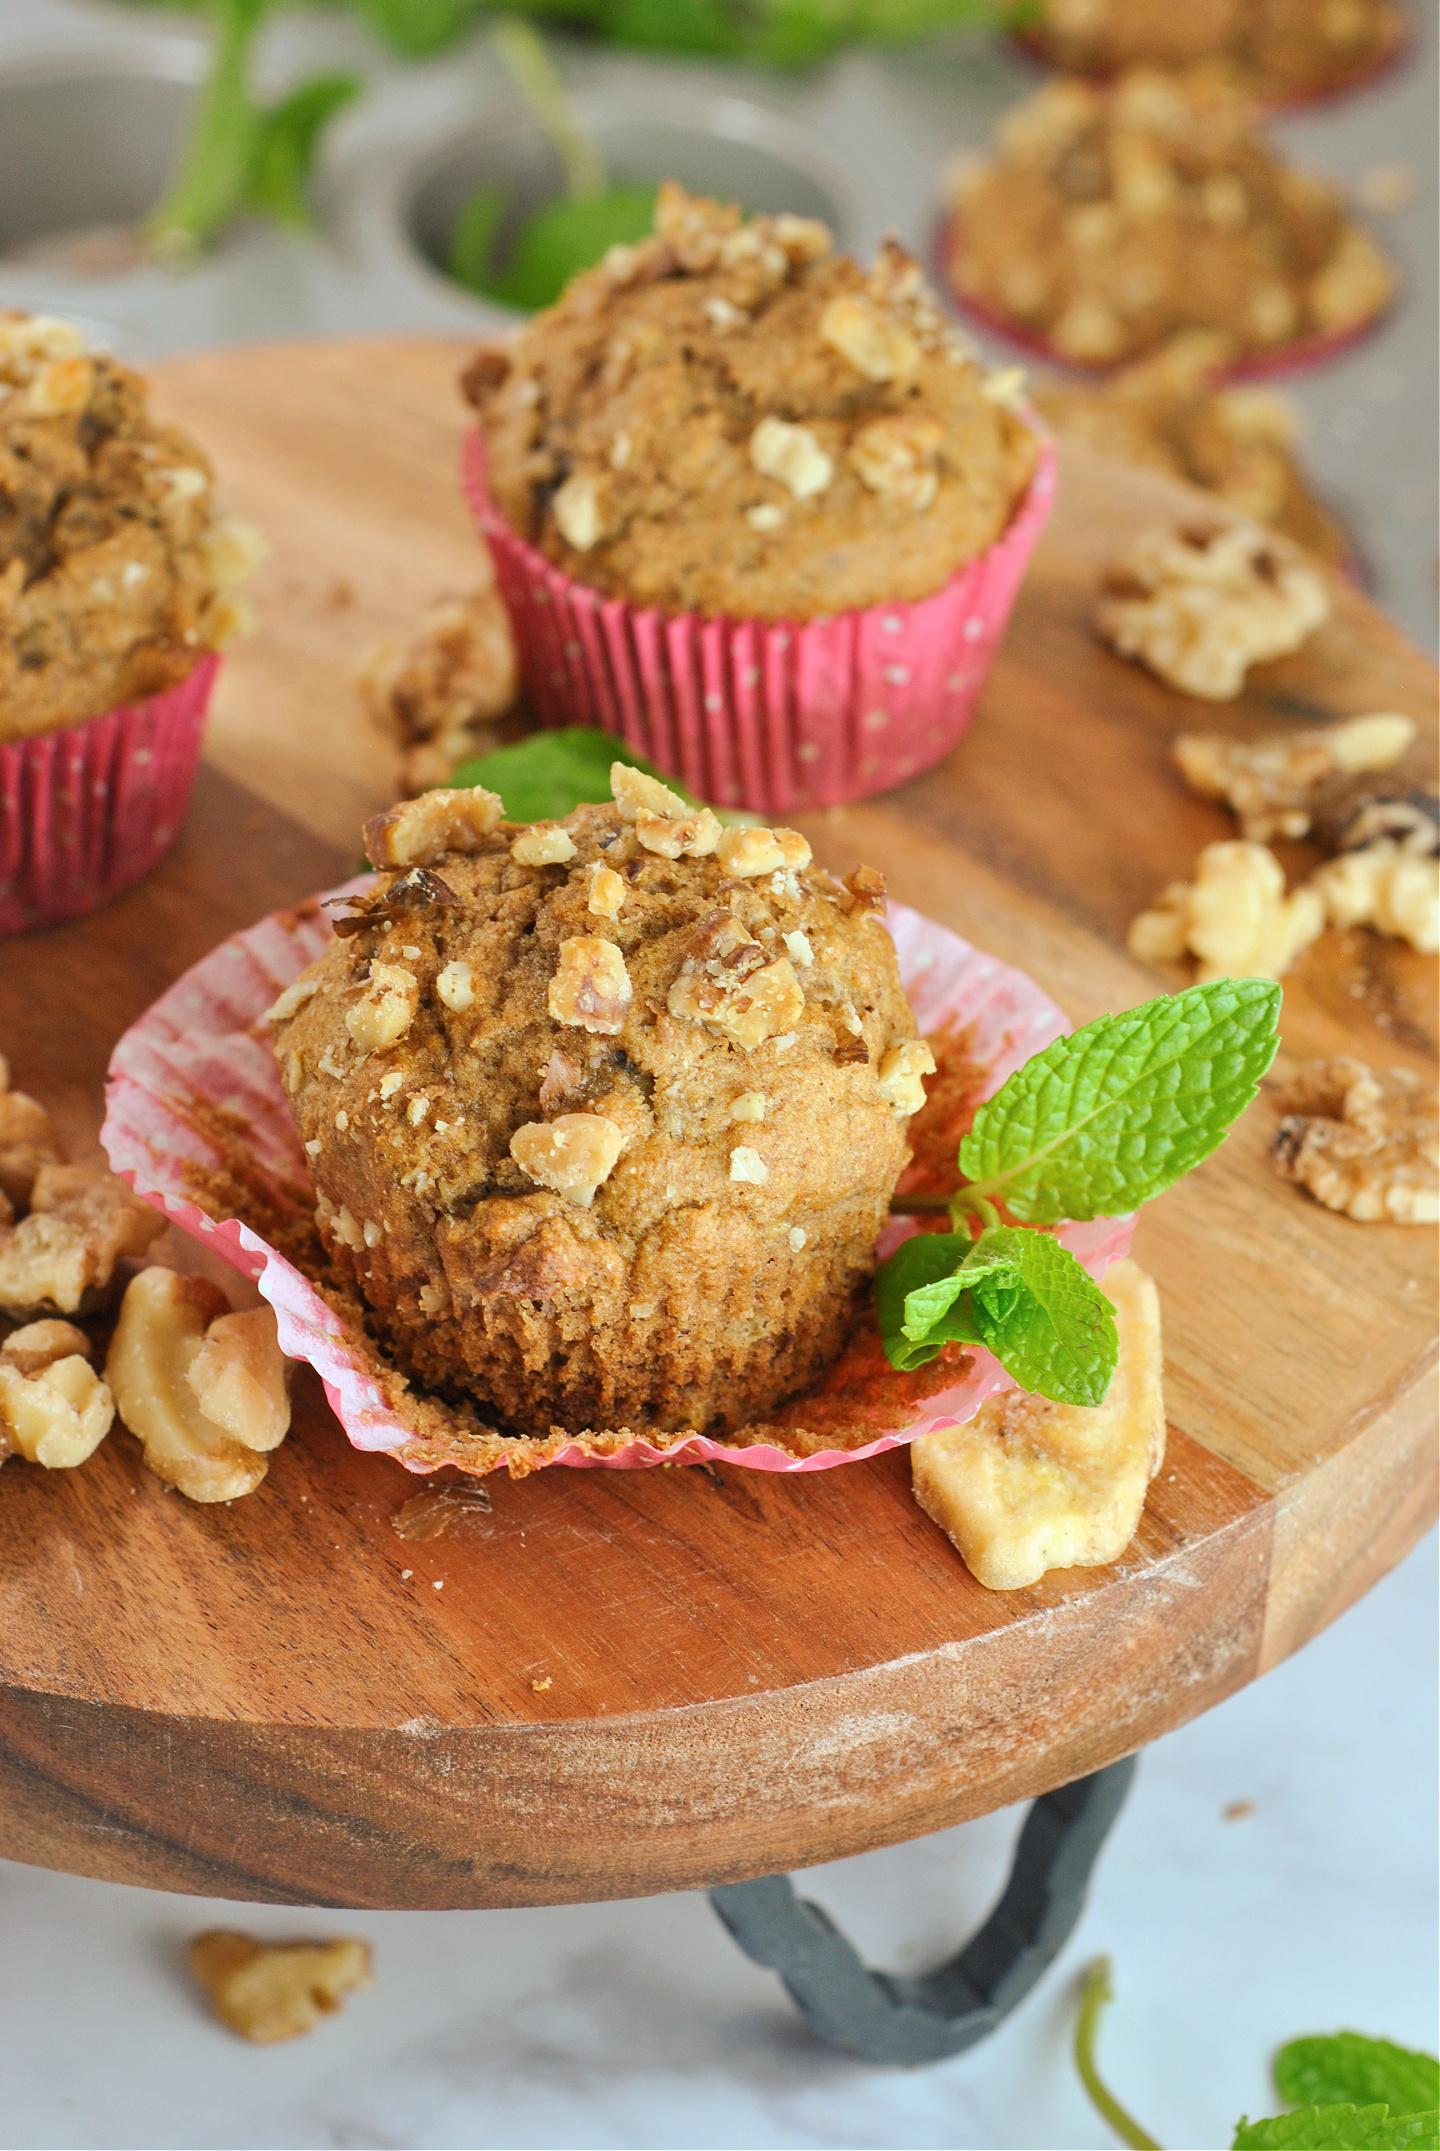 Honey Cinnamon Walnut Banana Muffins via @preventionrd